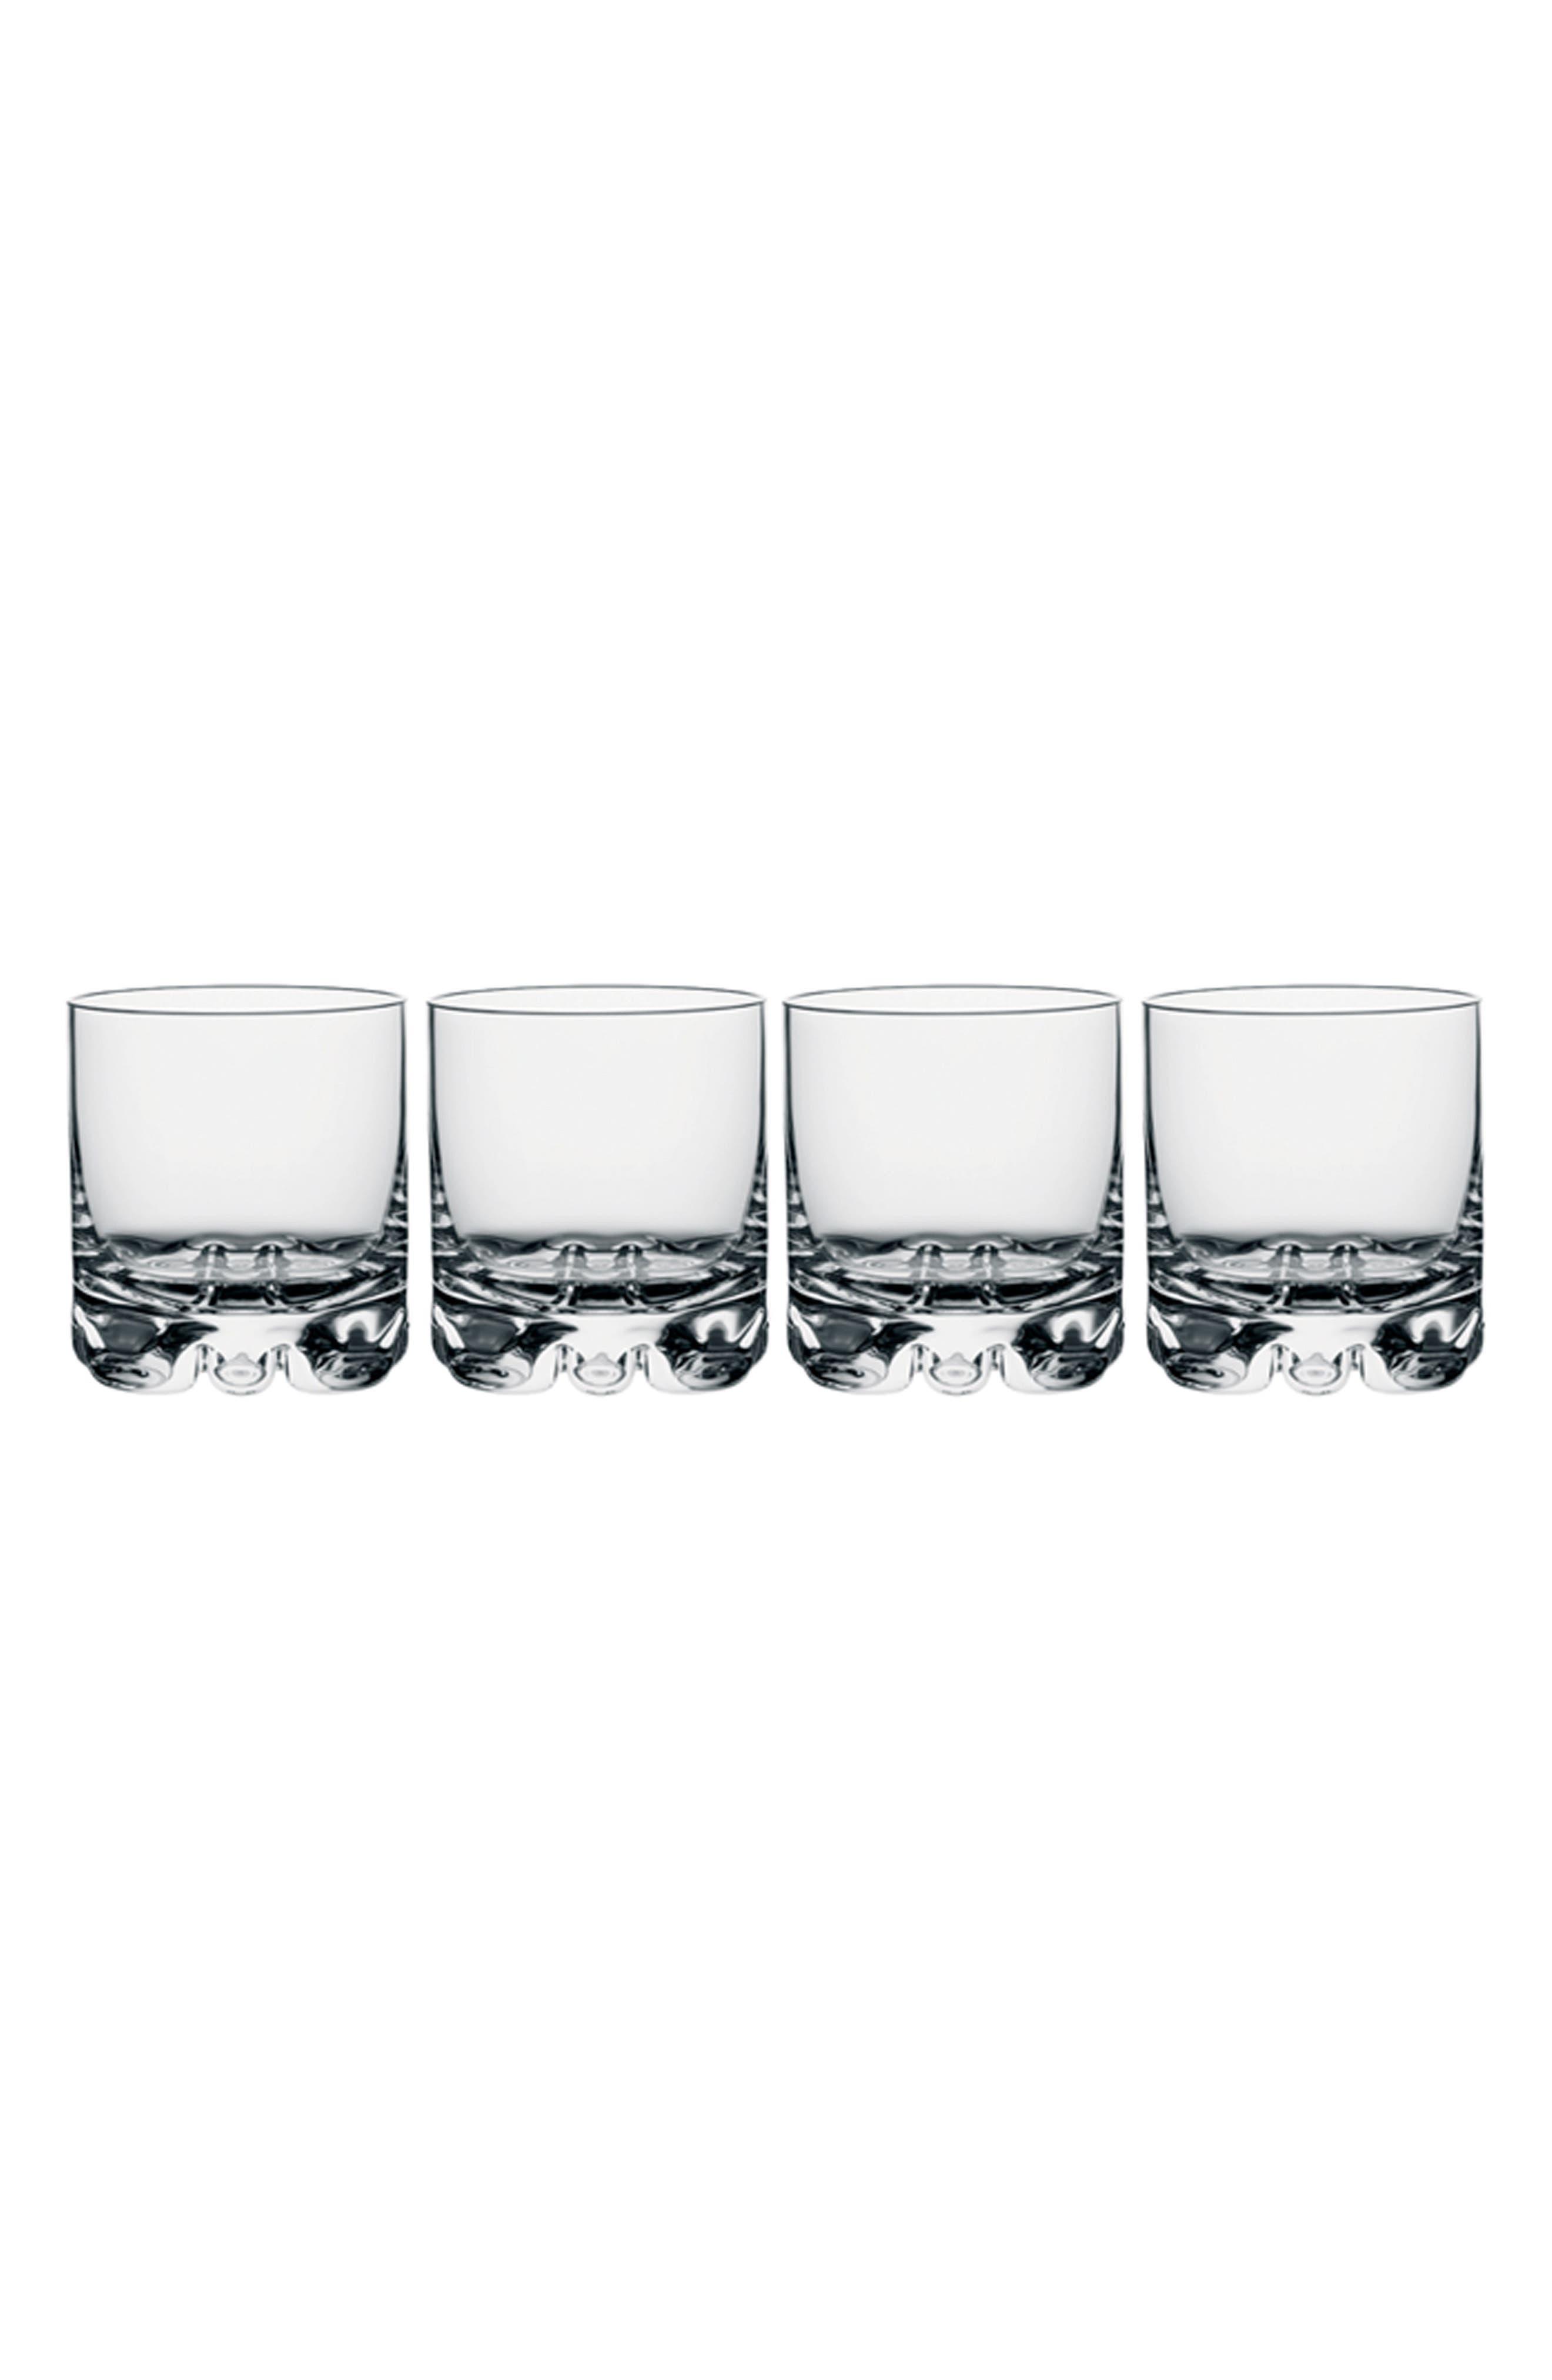 Erik Set of 4 Double Old Fashioned Glasses,                             Main thumbnail 1, color,                             100